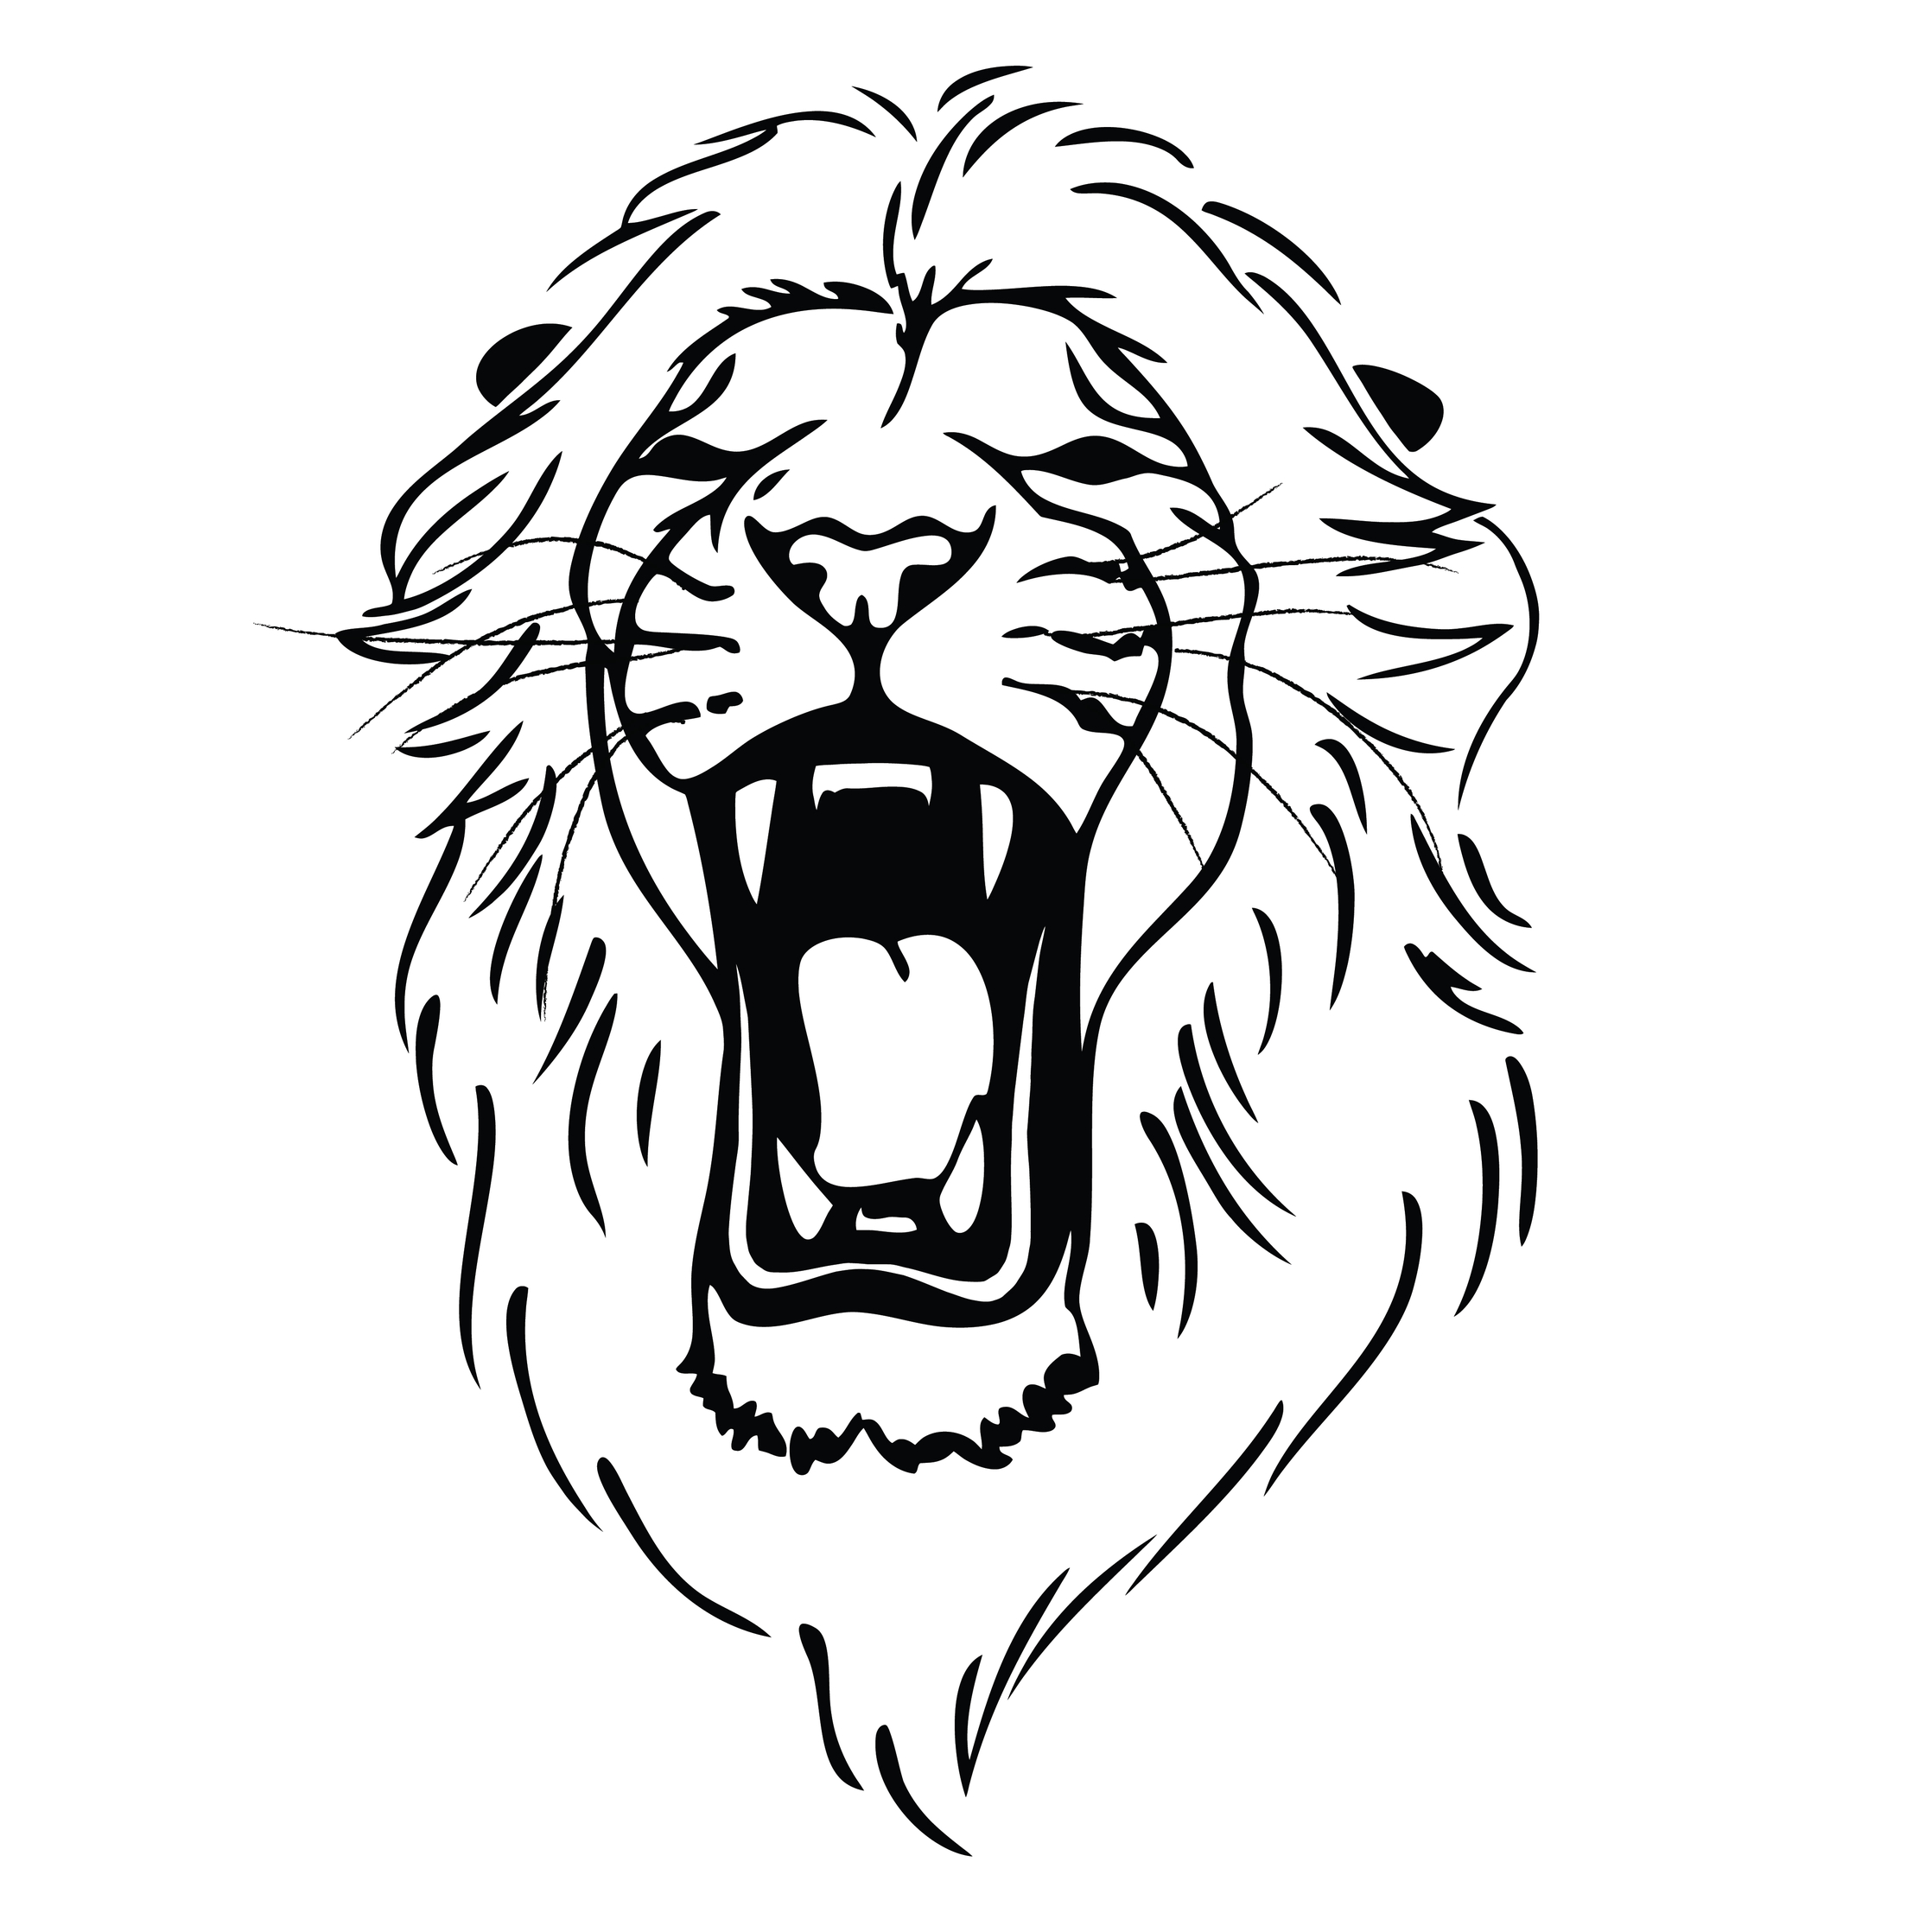 Lion Tattoo Images amp Designs